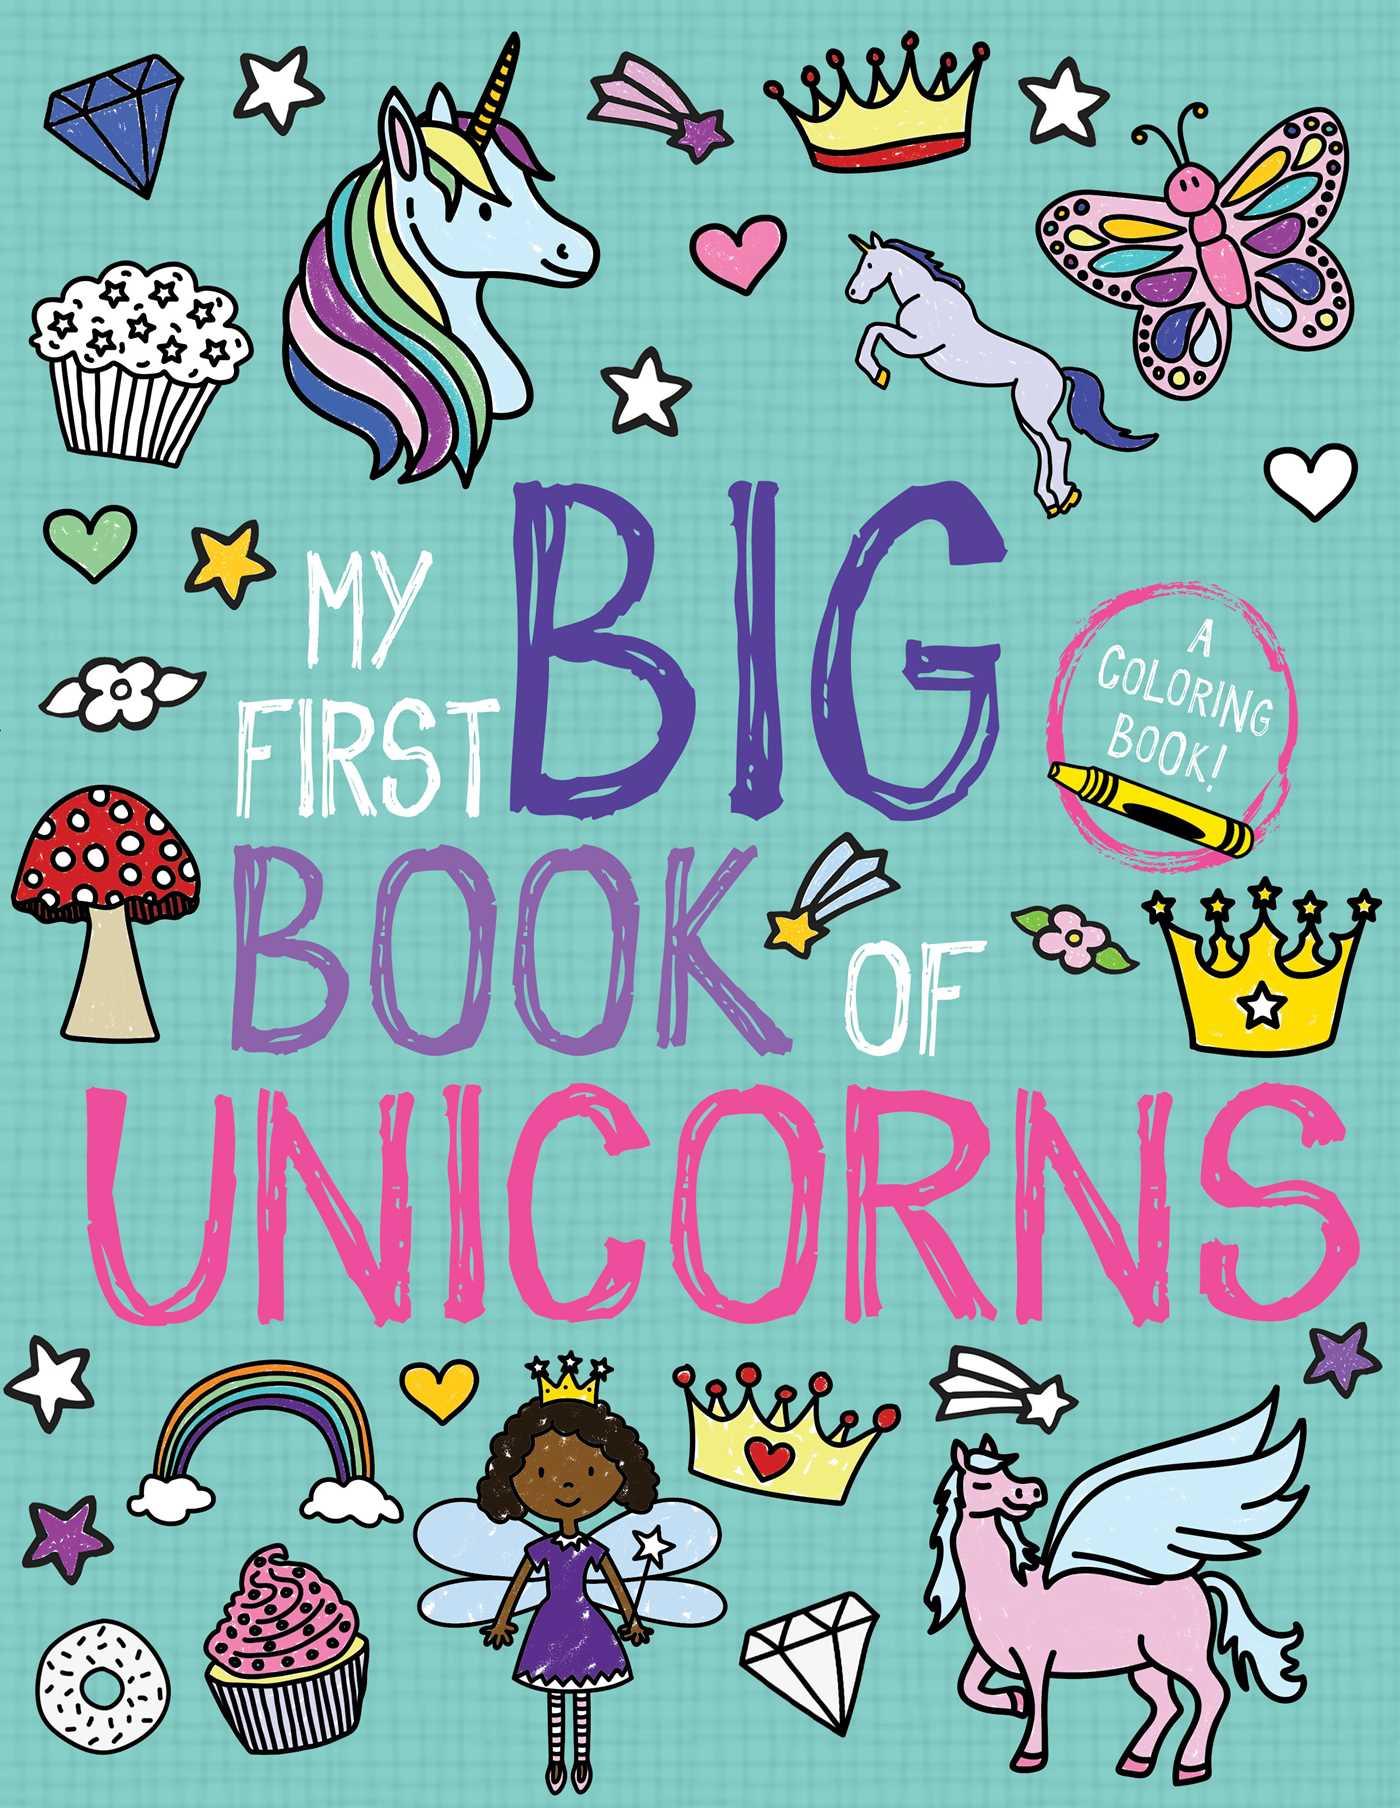 My first big book of unicorns 9781499807745 hr